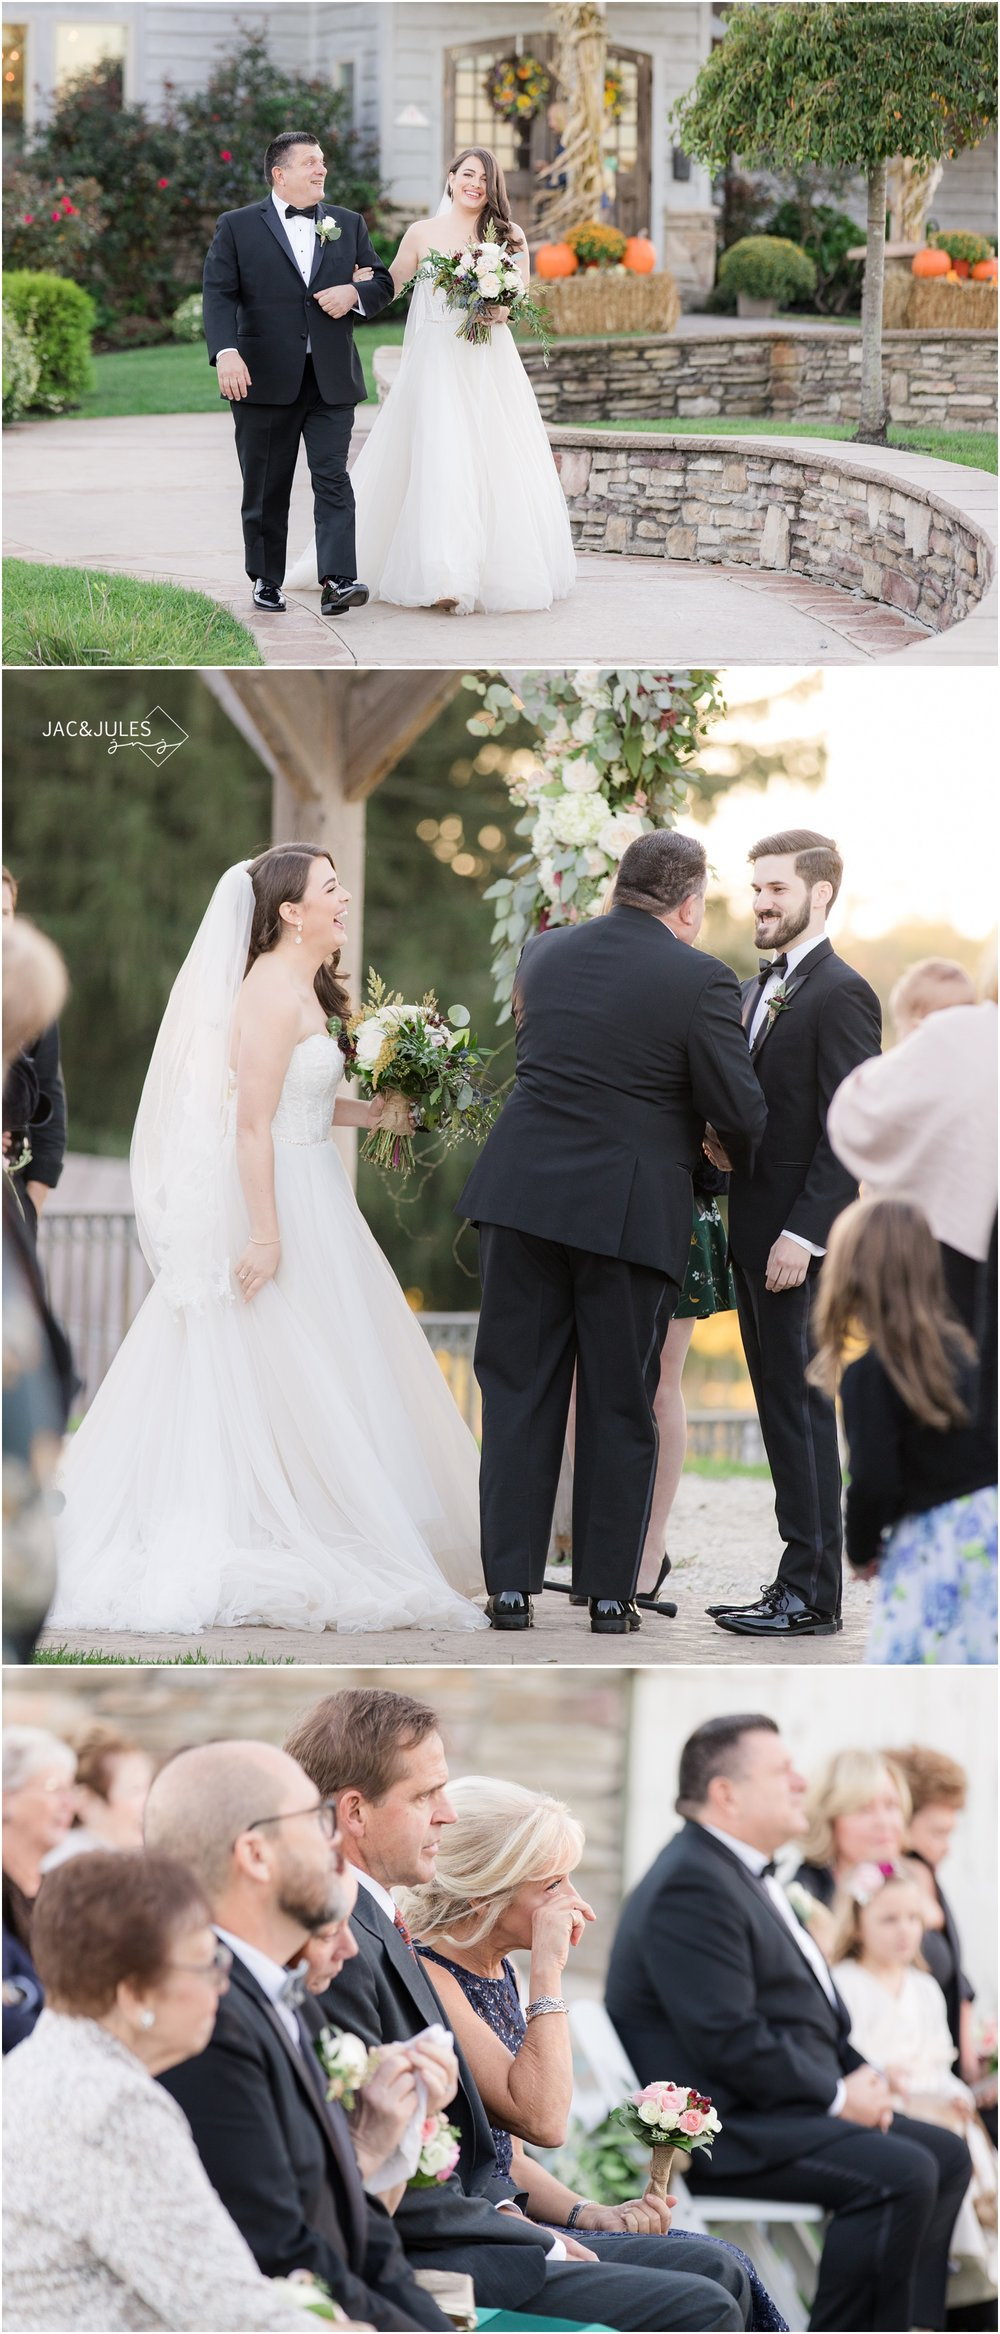 Wedding ceremony photos at Laurita Winery.